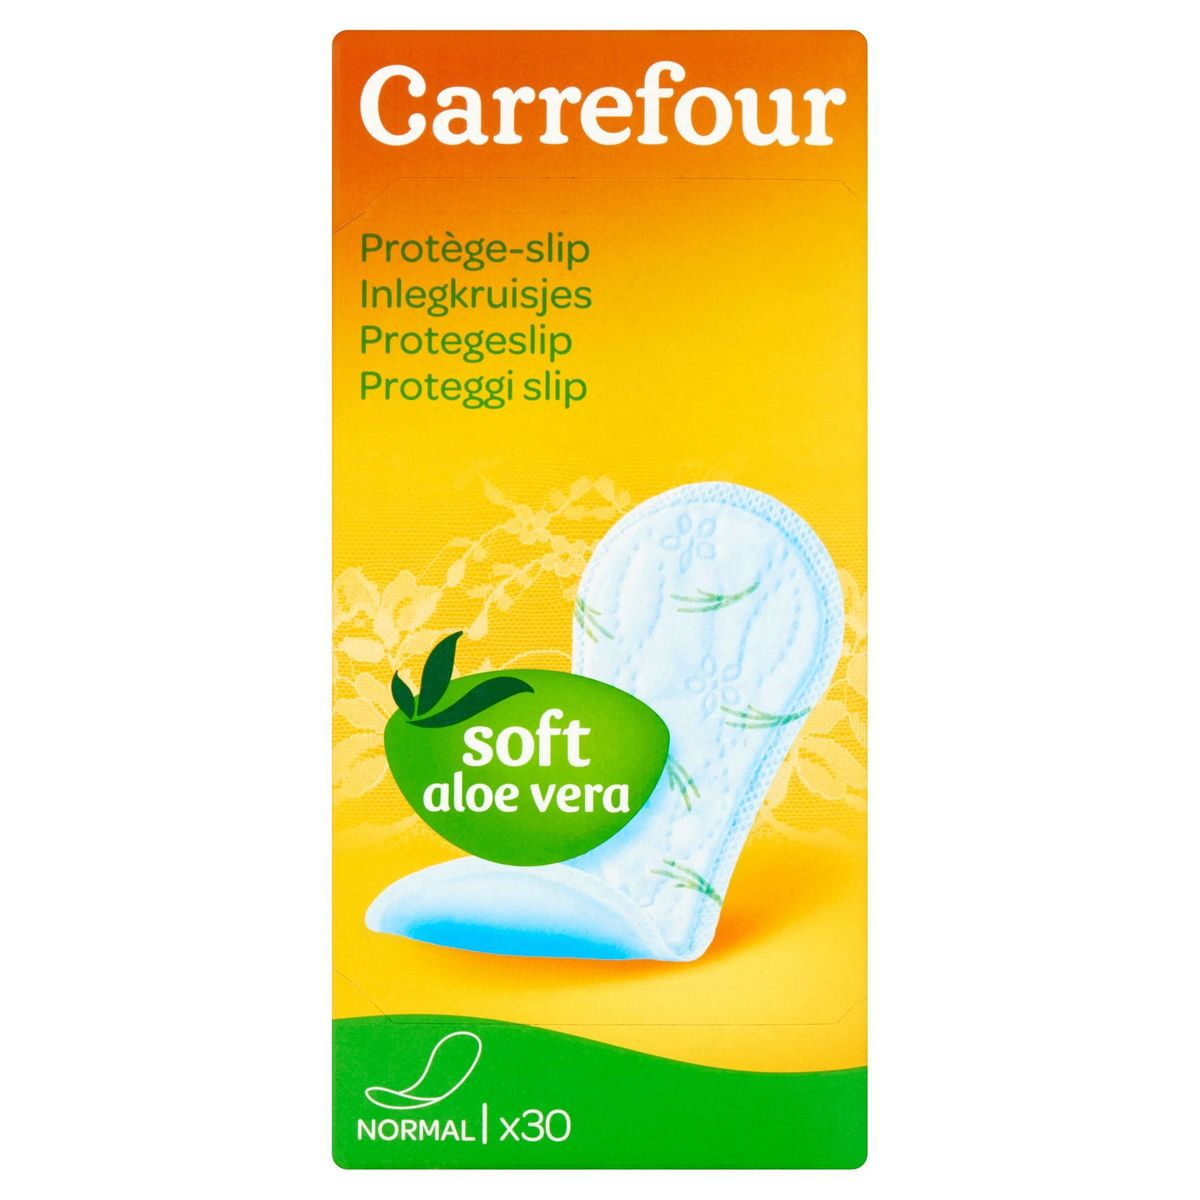 Carrefour Inlegkruisjes Soft Aloe Vera Normal 30 Stuks